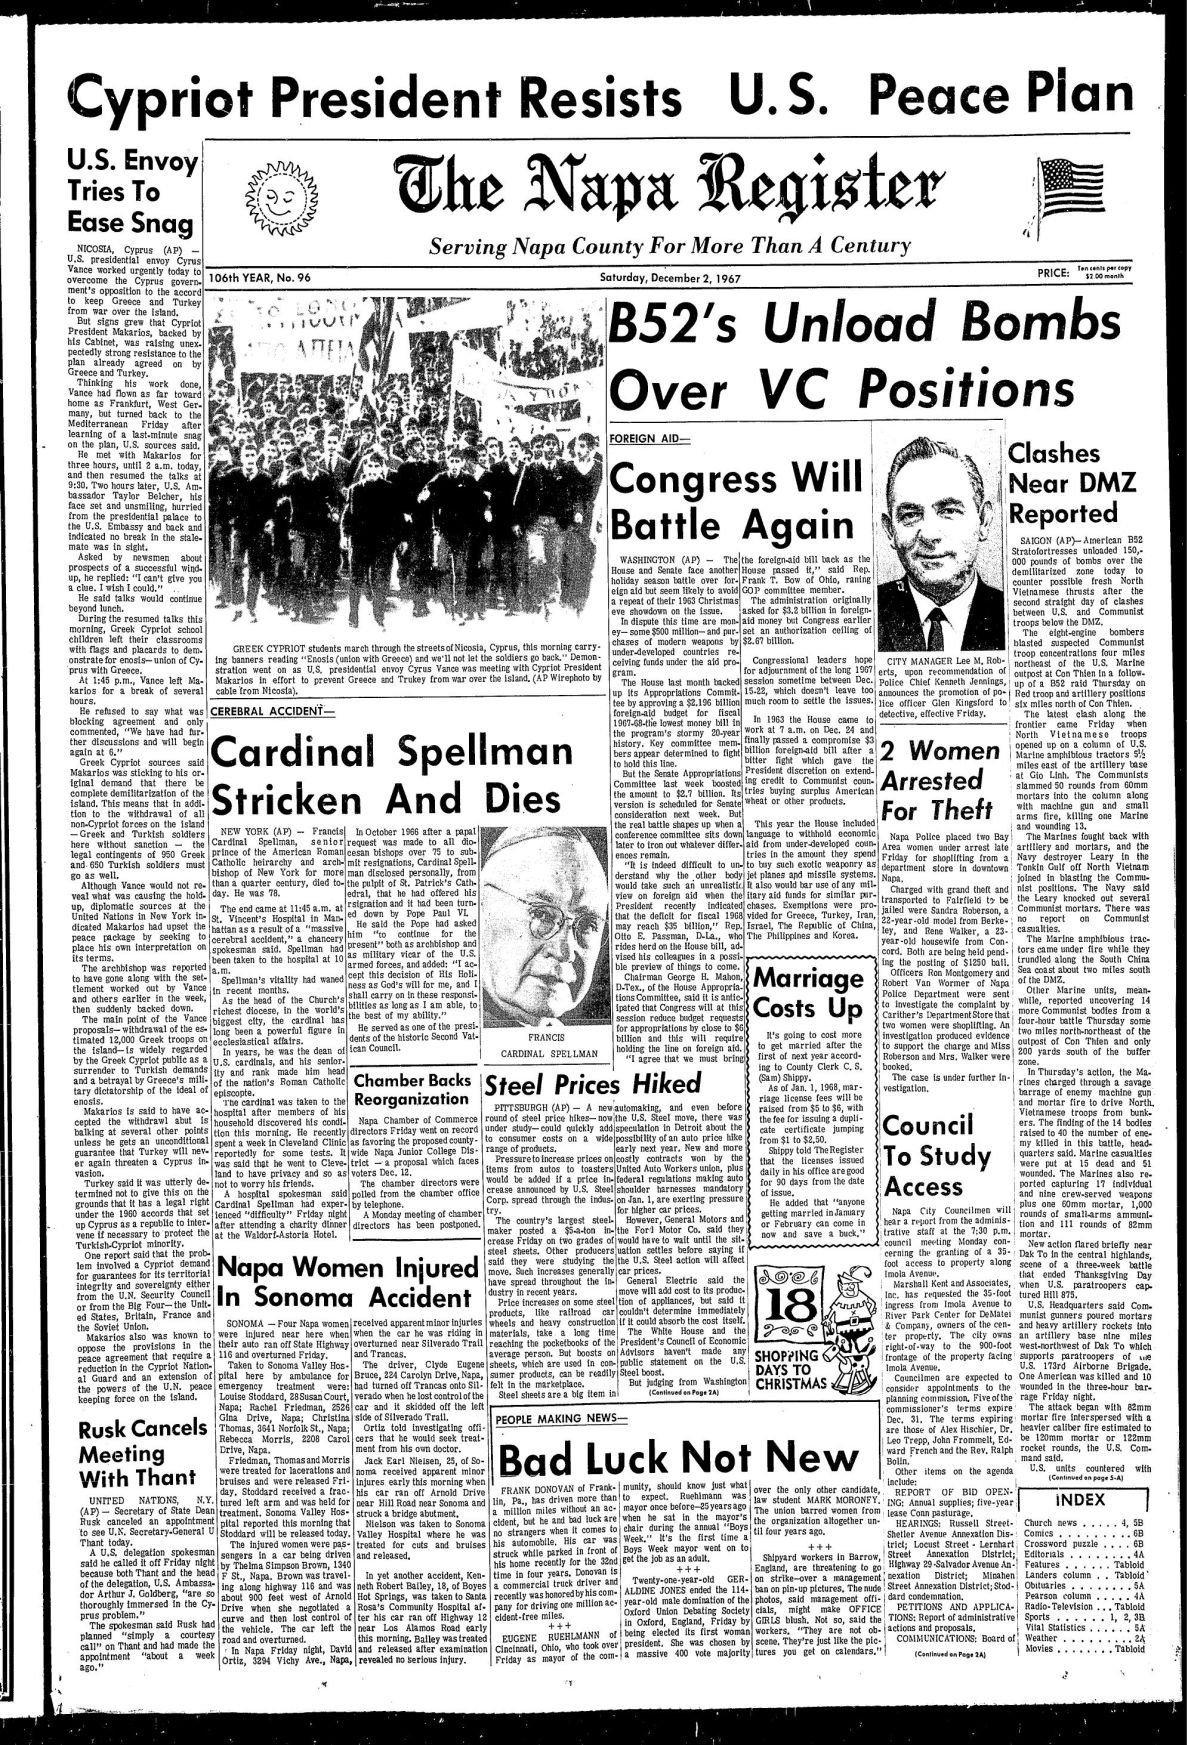 Dec. 2, 1967